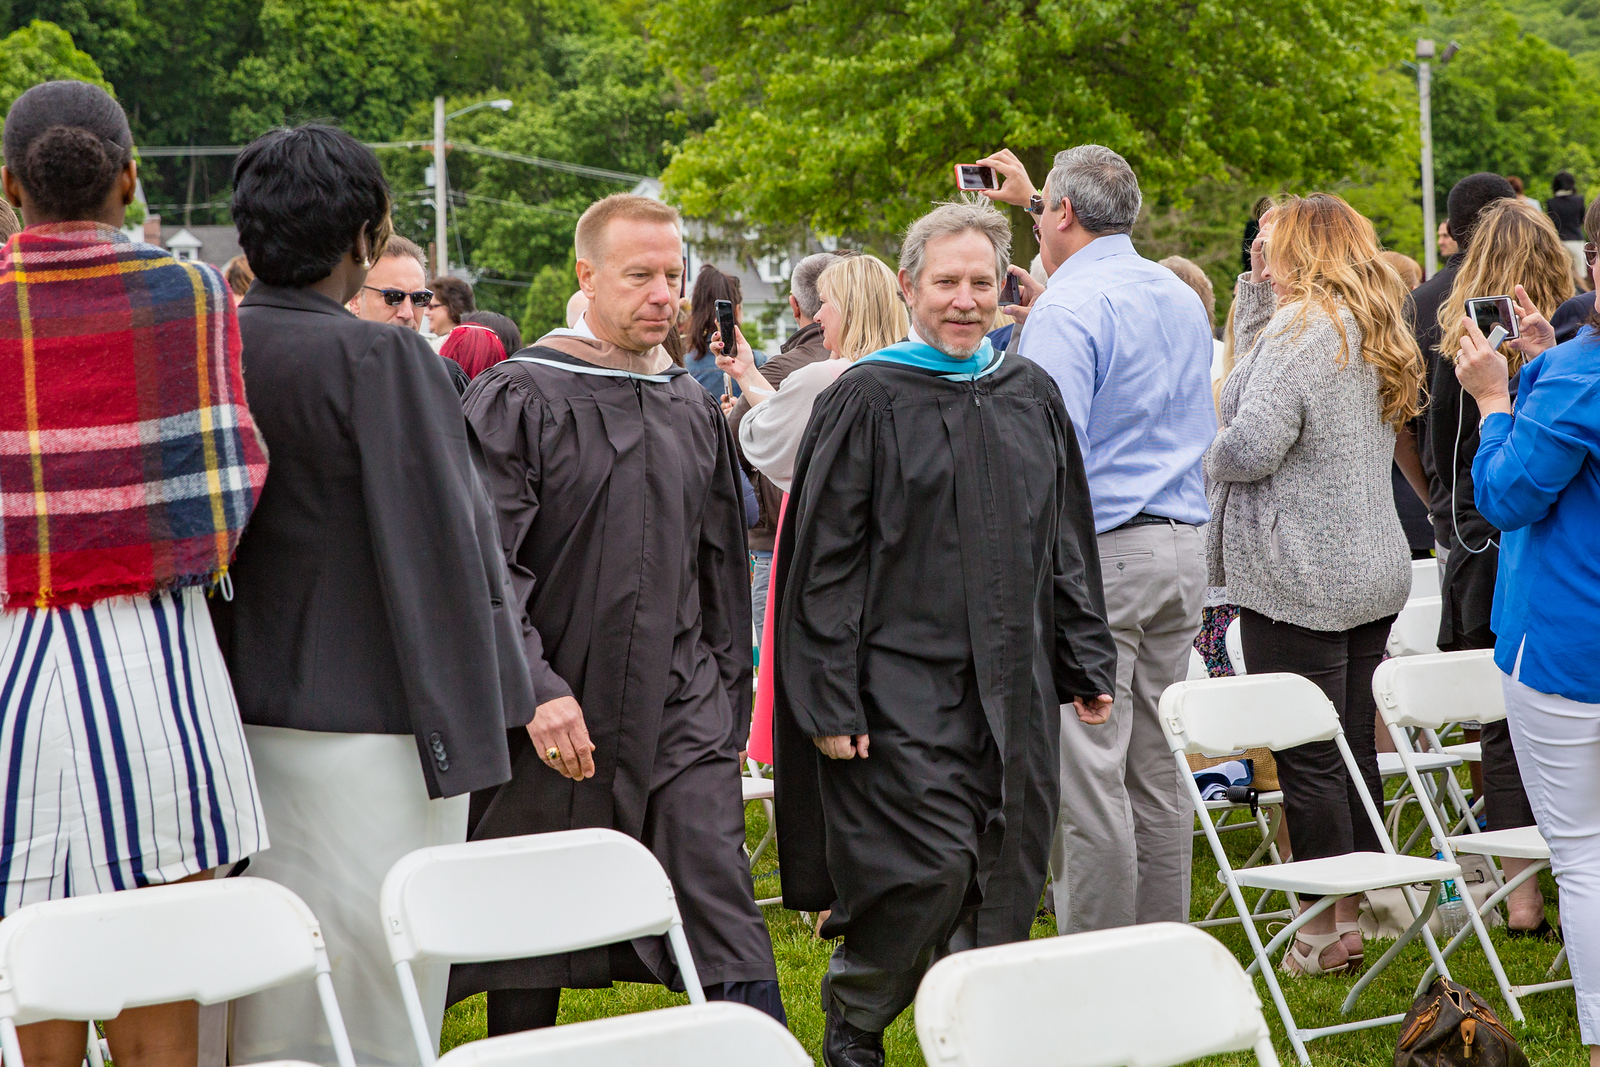 Col. Timothy Kopra and Headmaster Jonathan Lamb lead the processional